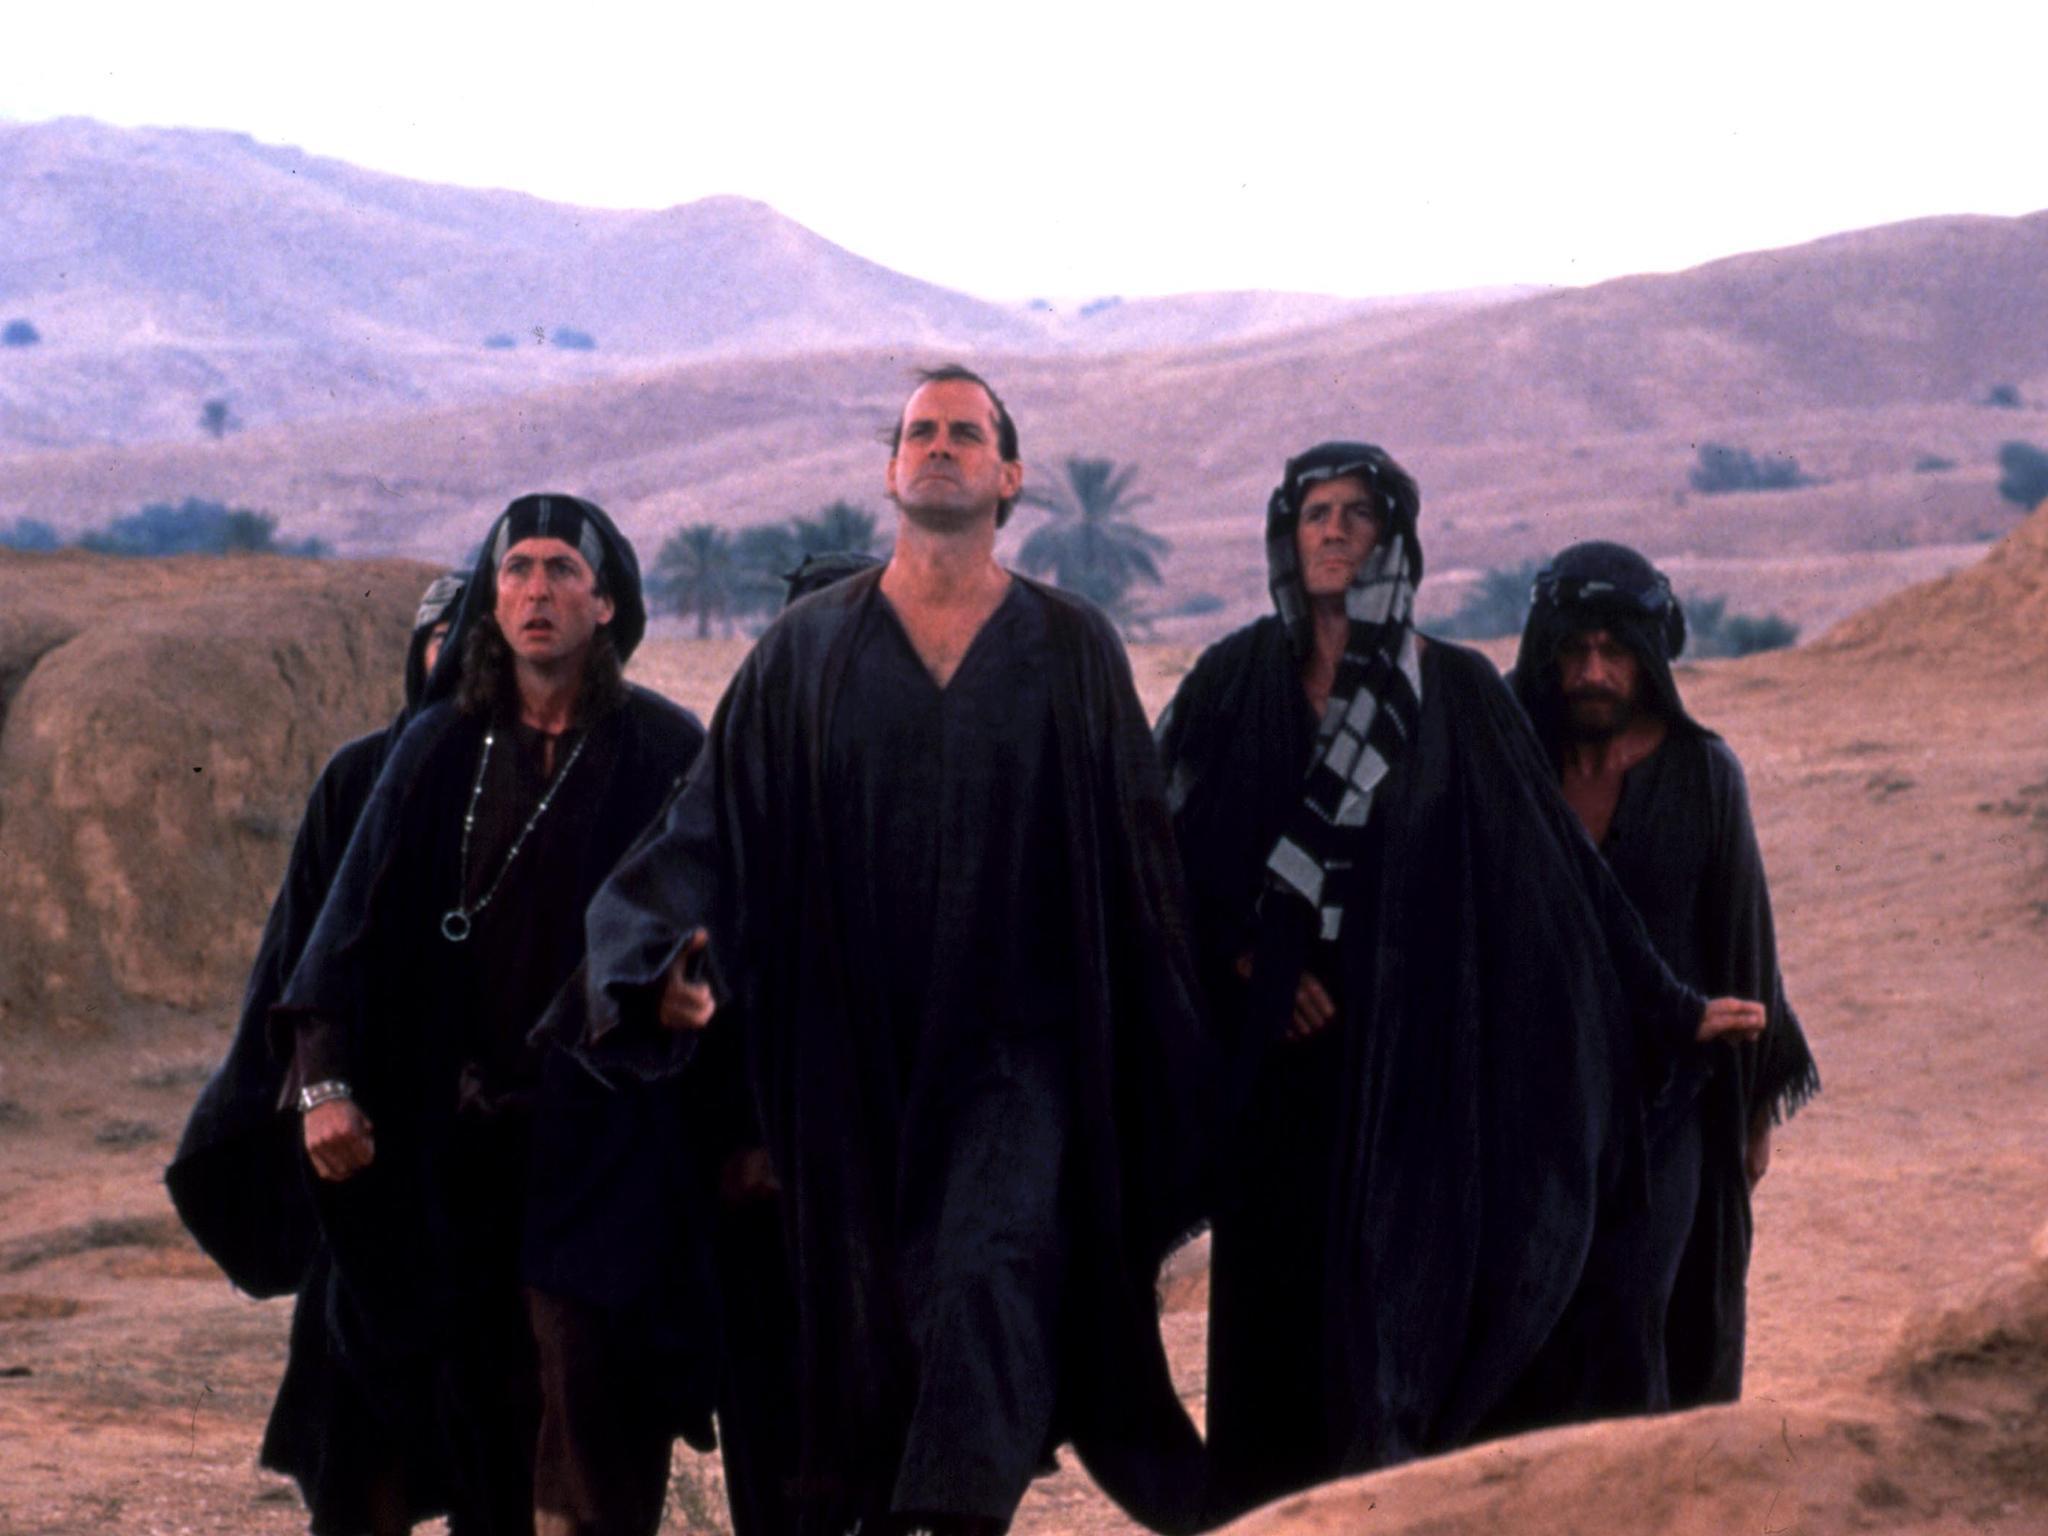 9. Monty Python's Life of Brian